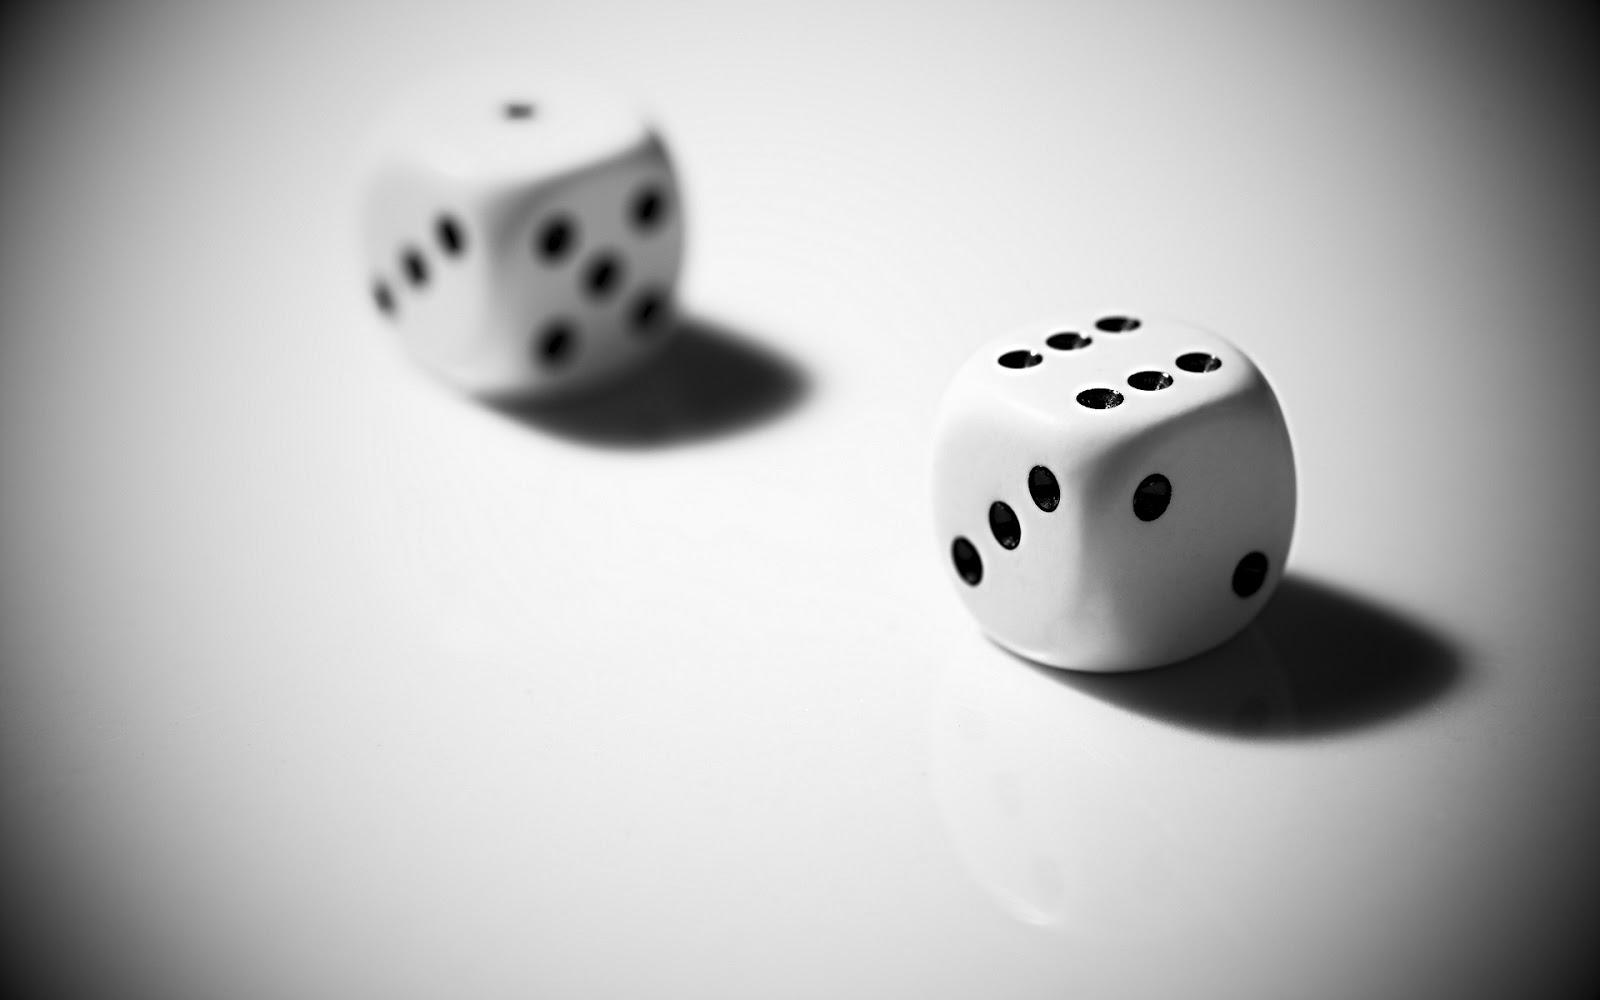 http://4.bp.blogspot.com/-Yd-p4SxjSCA/UQv5nf2I5eI/AAAAAAAAARo/JGqfjeALN3c/s1600/dice+black+and+white+picture.jpg